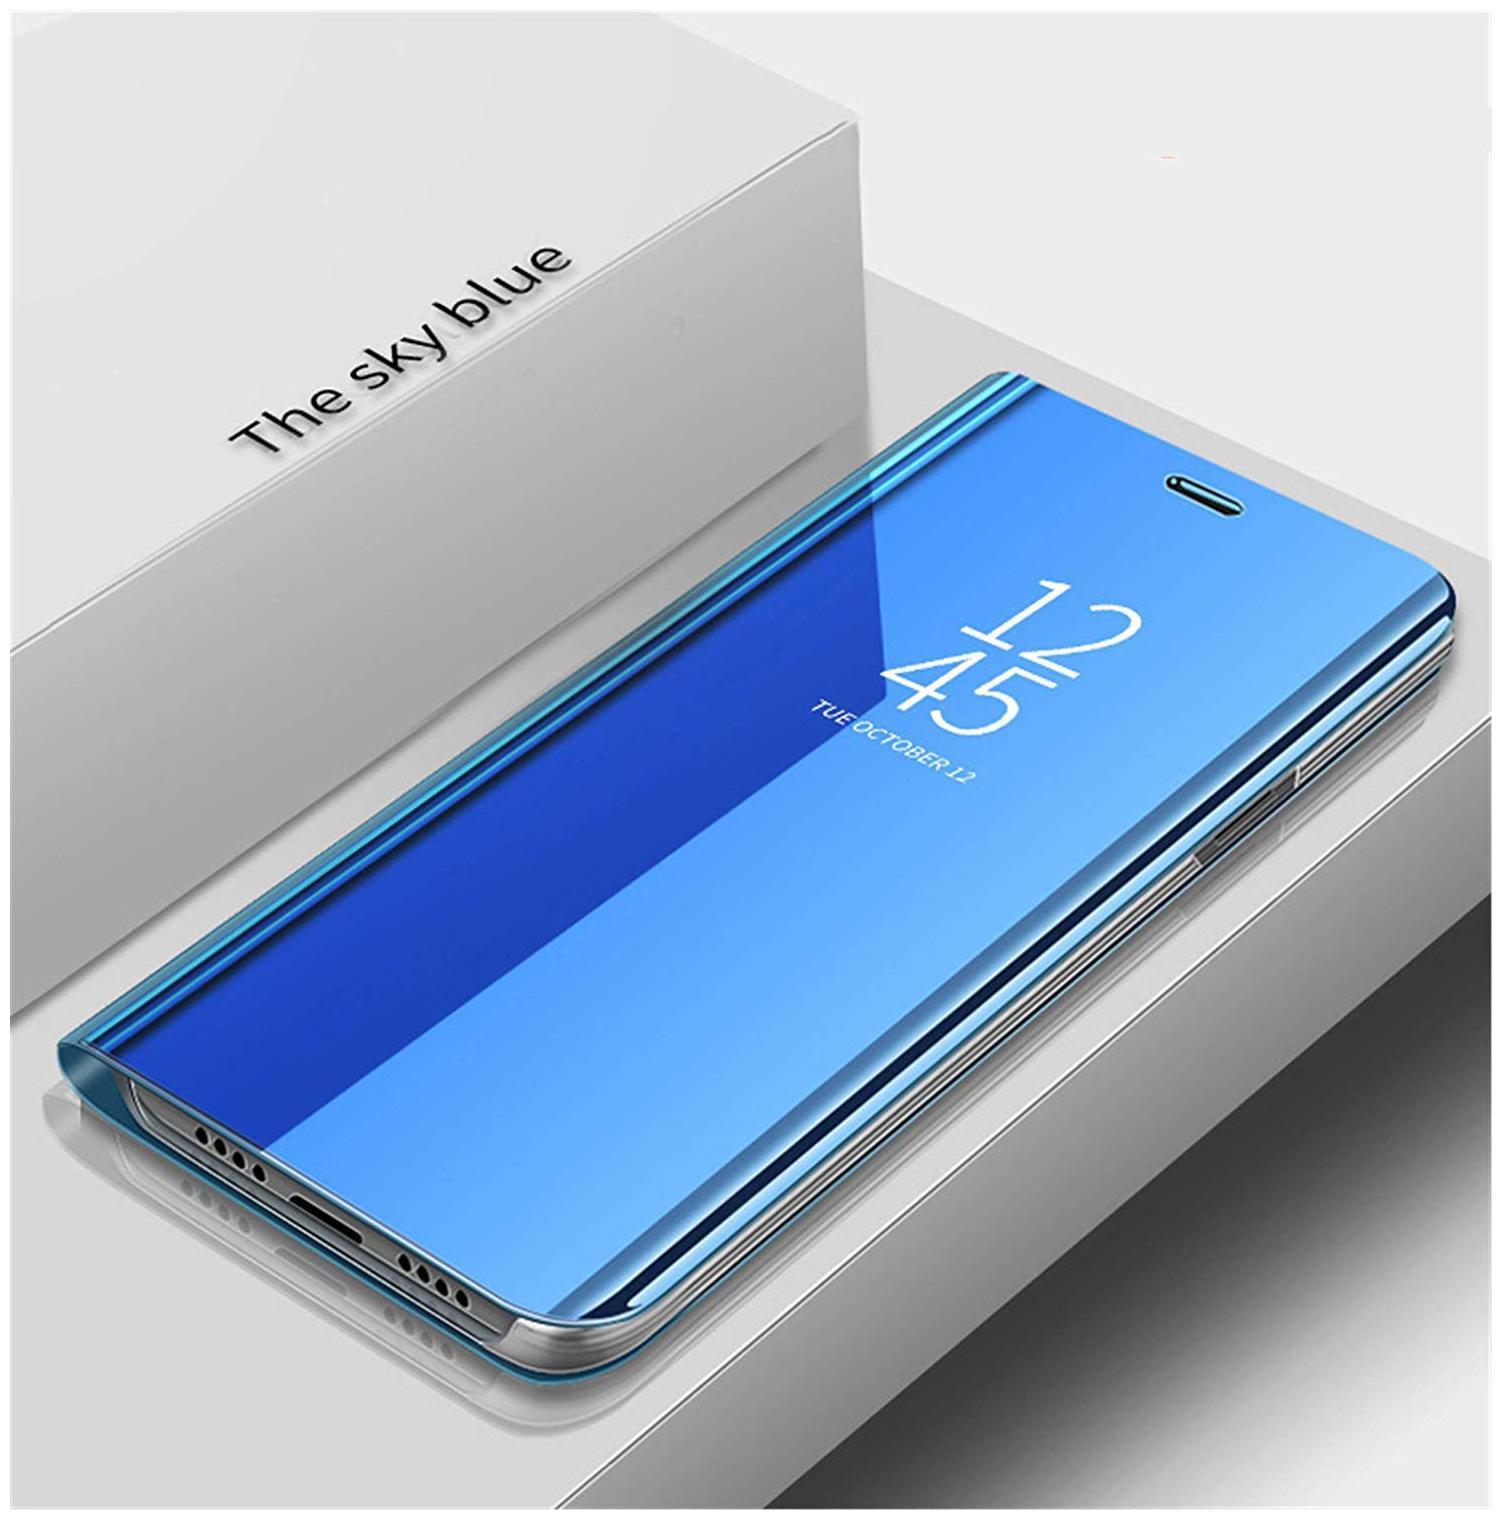 Samsung Galaxy S7 Edge Glass Flip Cover By EXOTIC FLOURISH   Blue   by Exotic Flourish